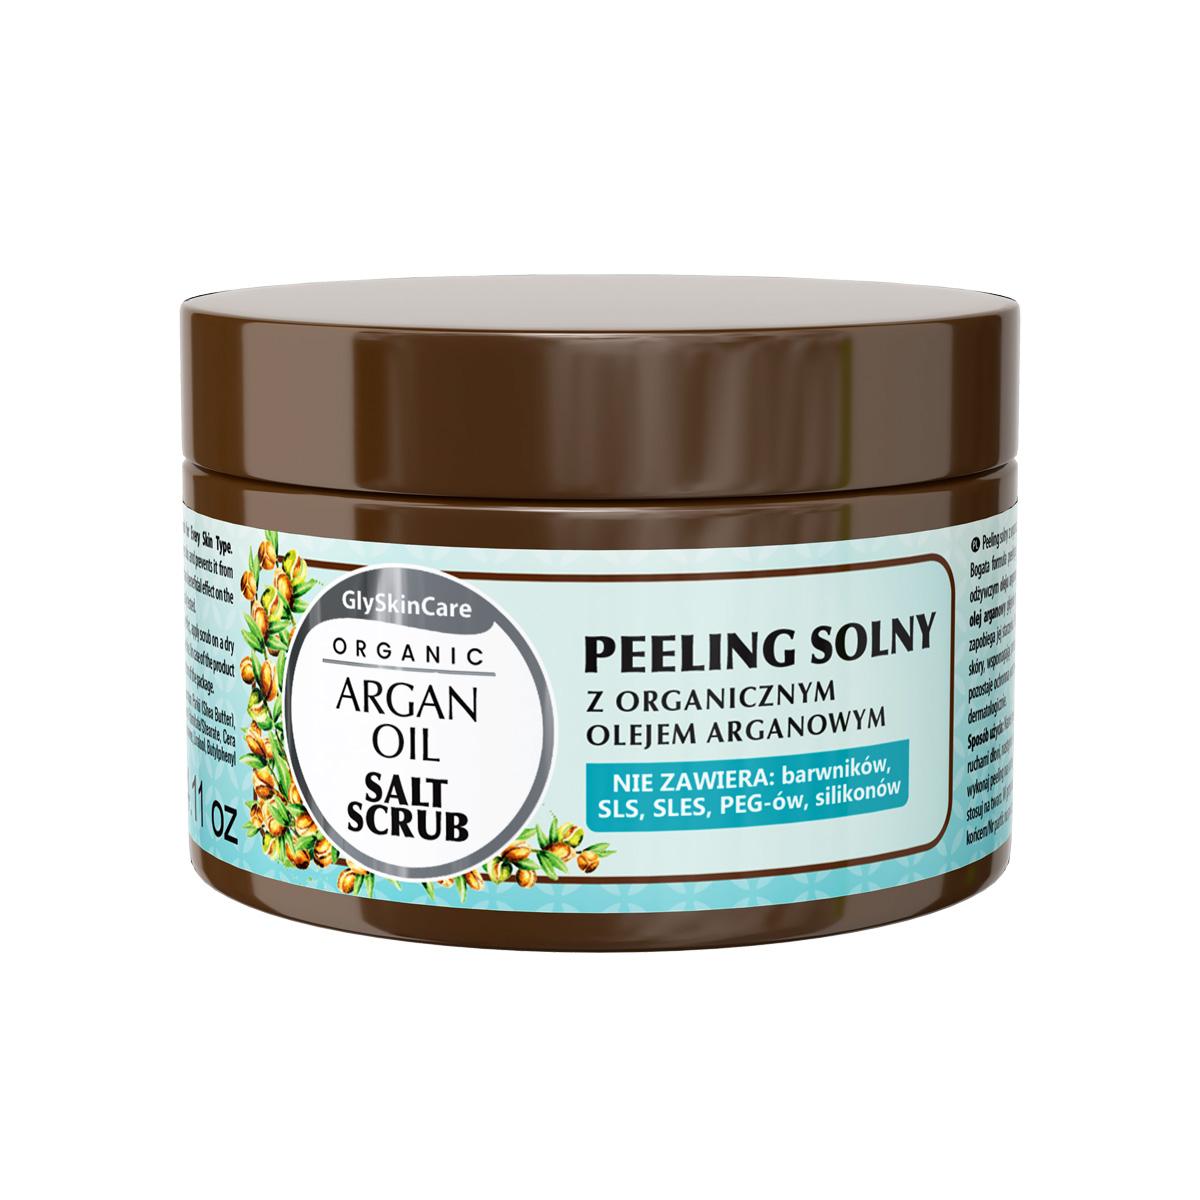 Biotter Solný peeling s organickým arganovým olejem 400 ml